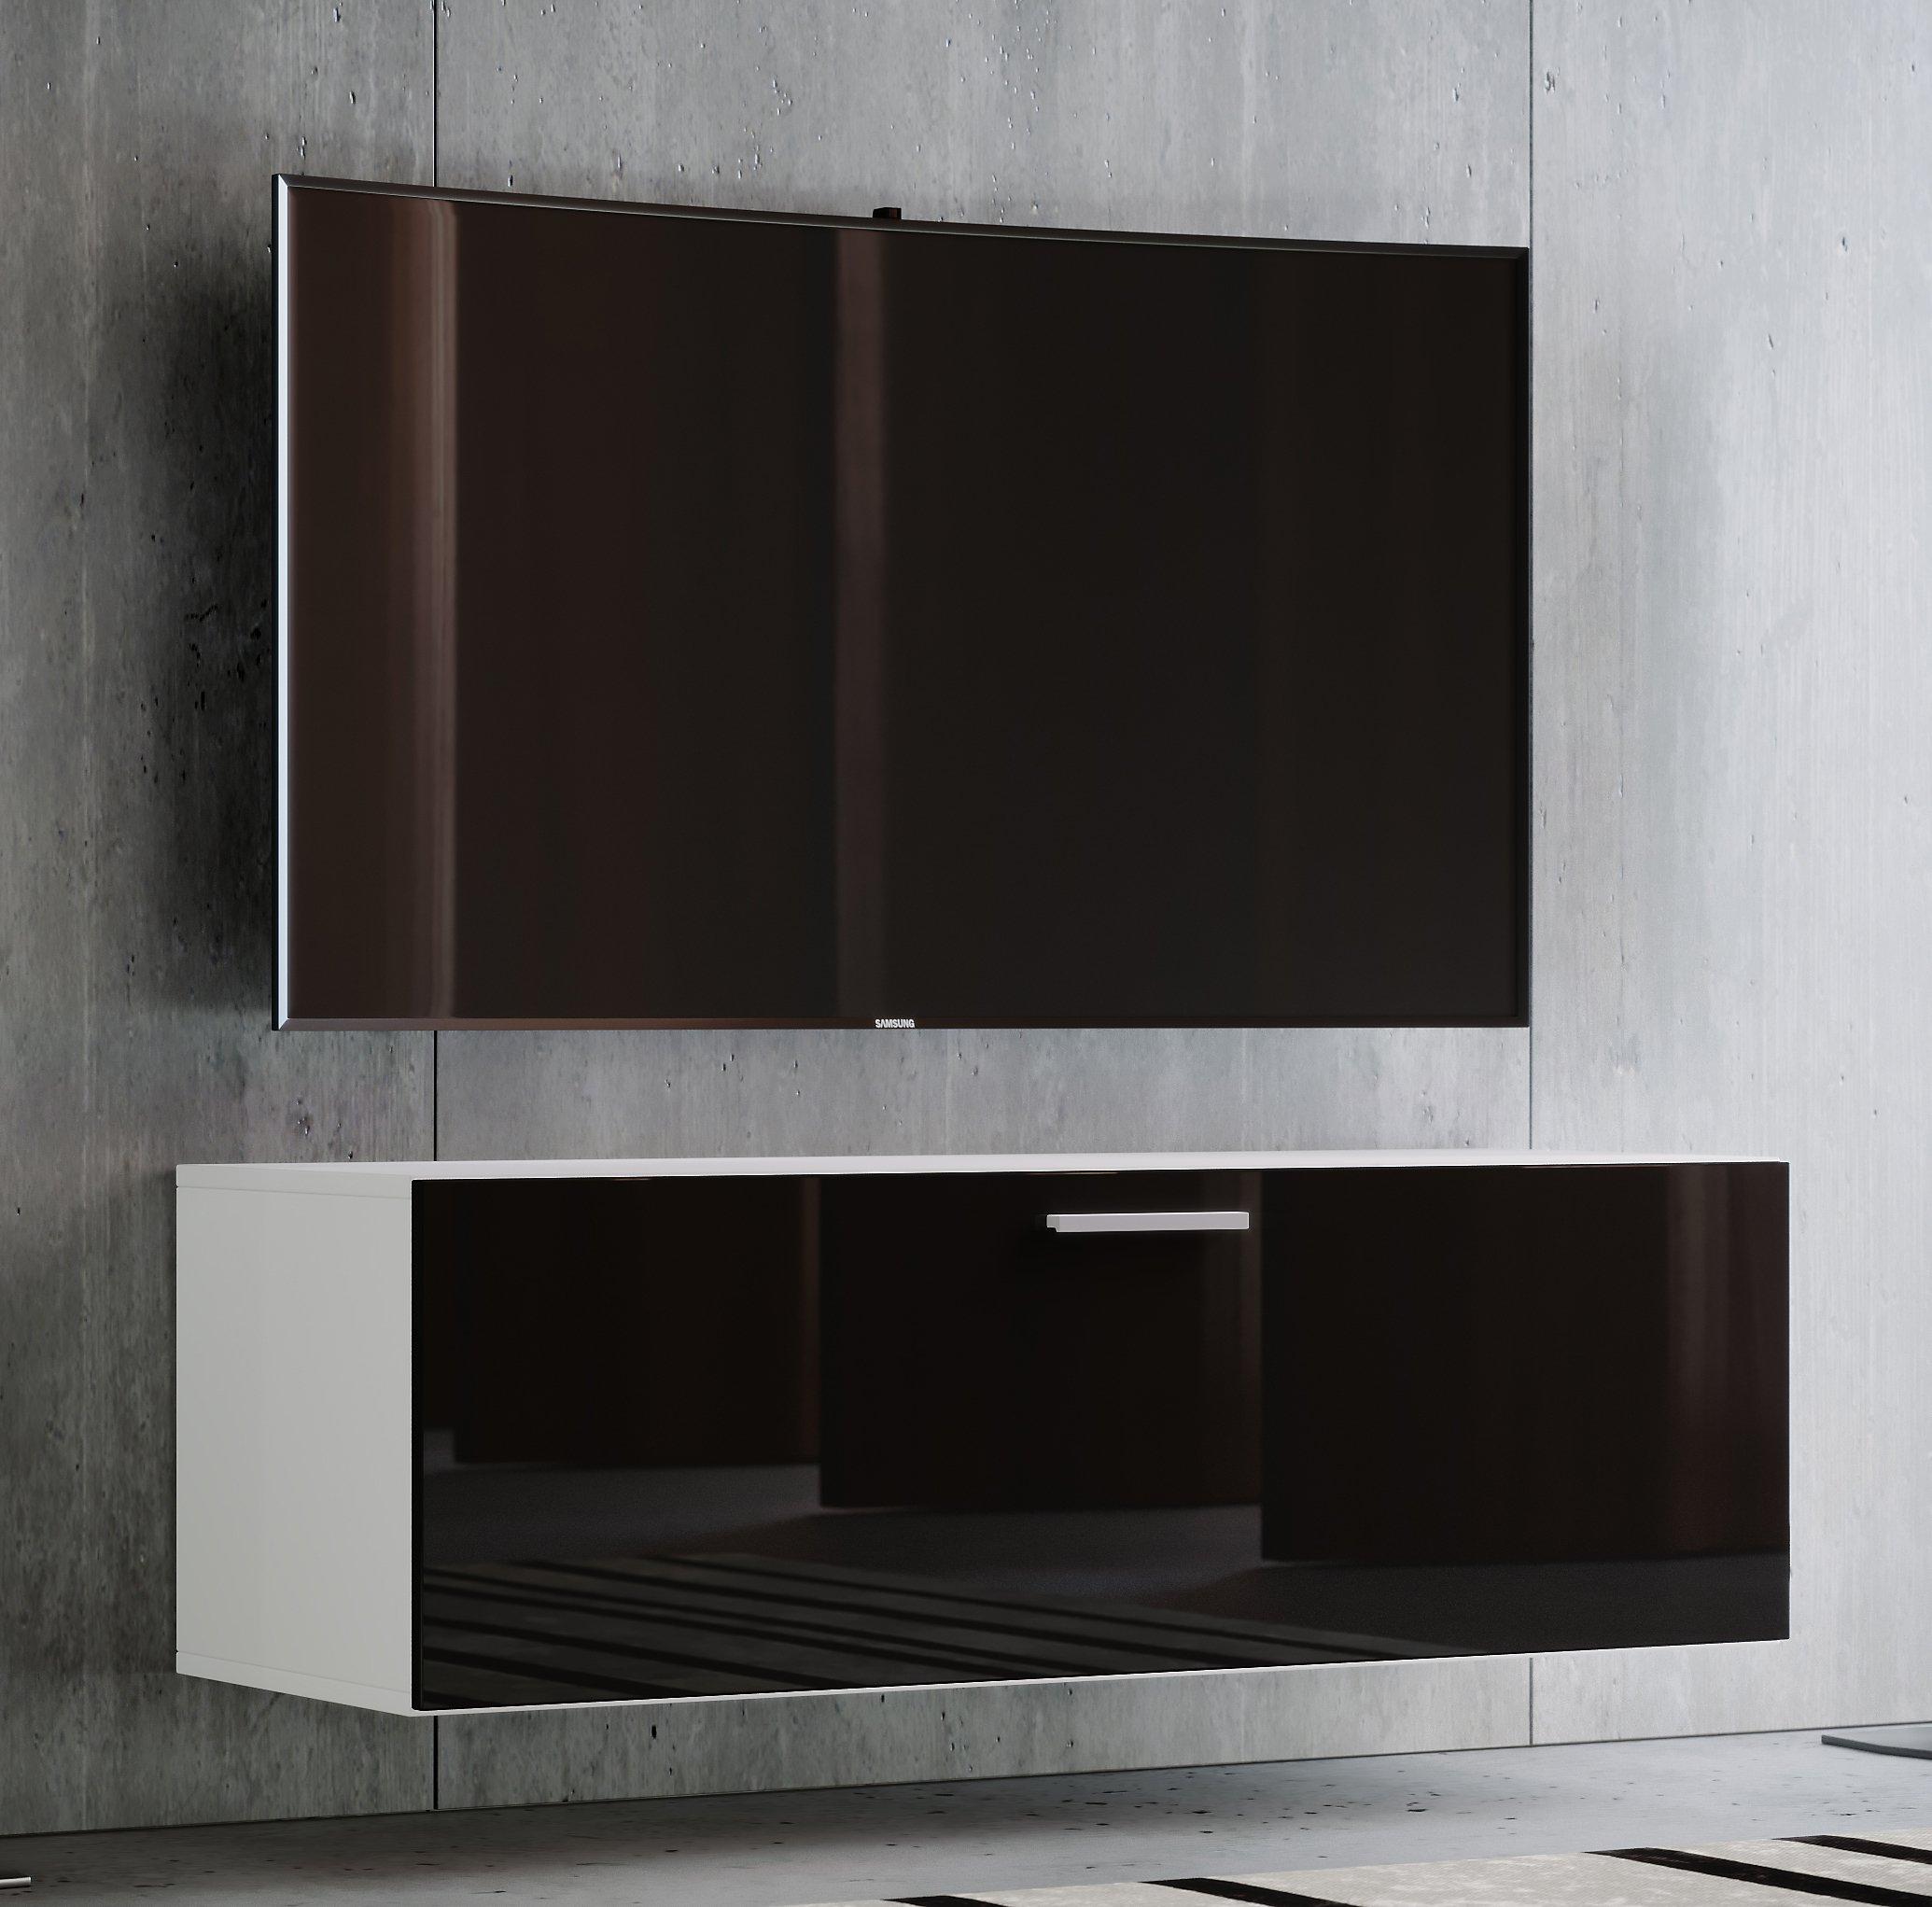 Vcm Tv Wand Board Fernsehtisch Lowboard Wohnwand Regal